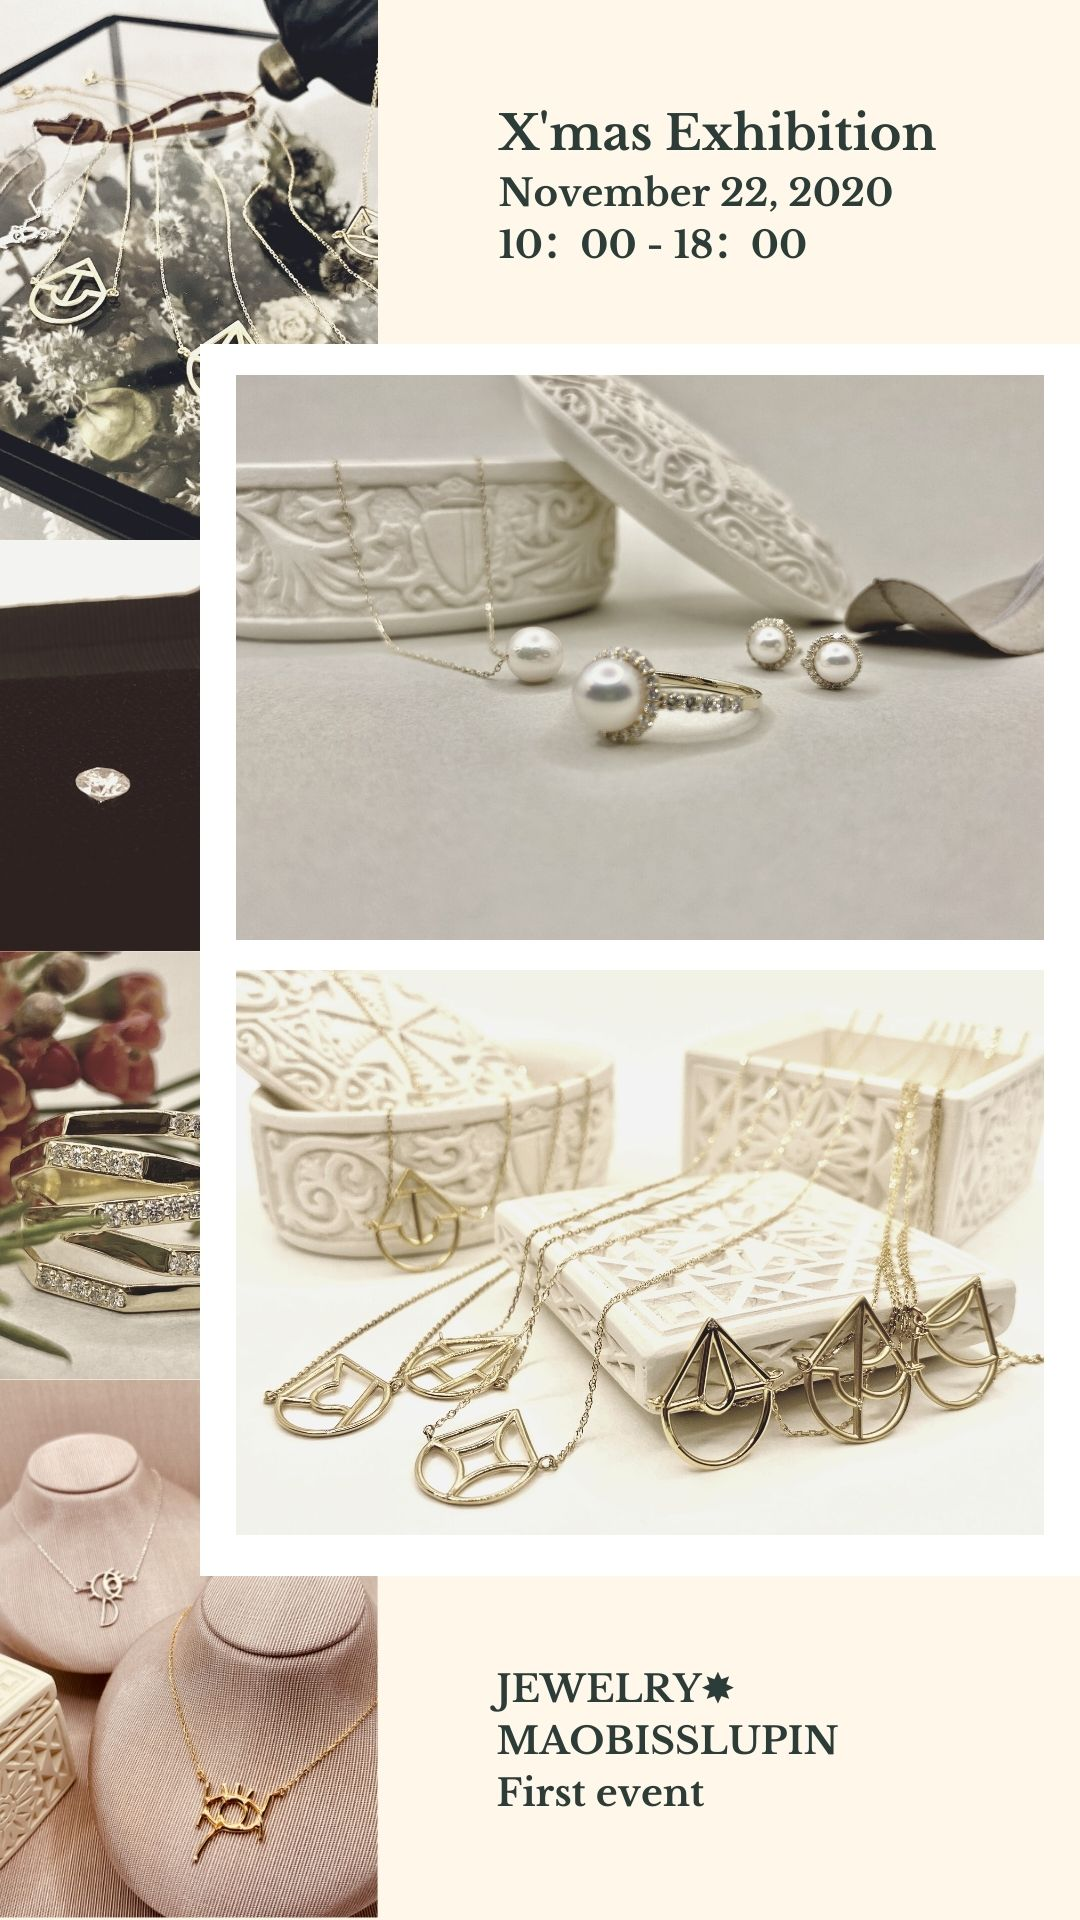 JewelryBrand MaoBissLupin  Xmas Exhibition